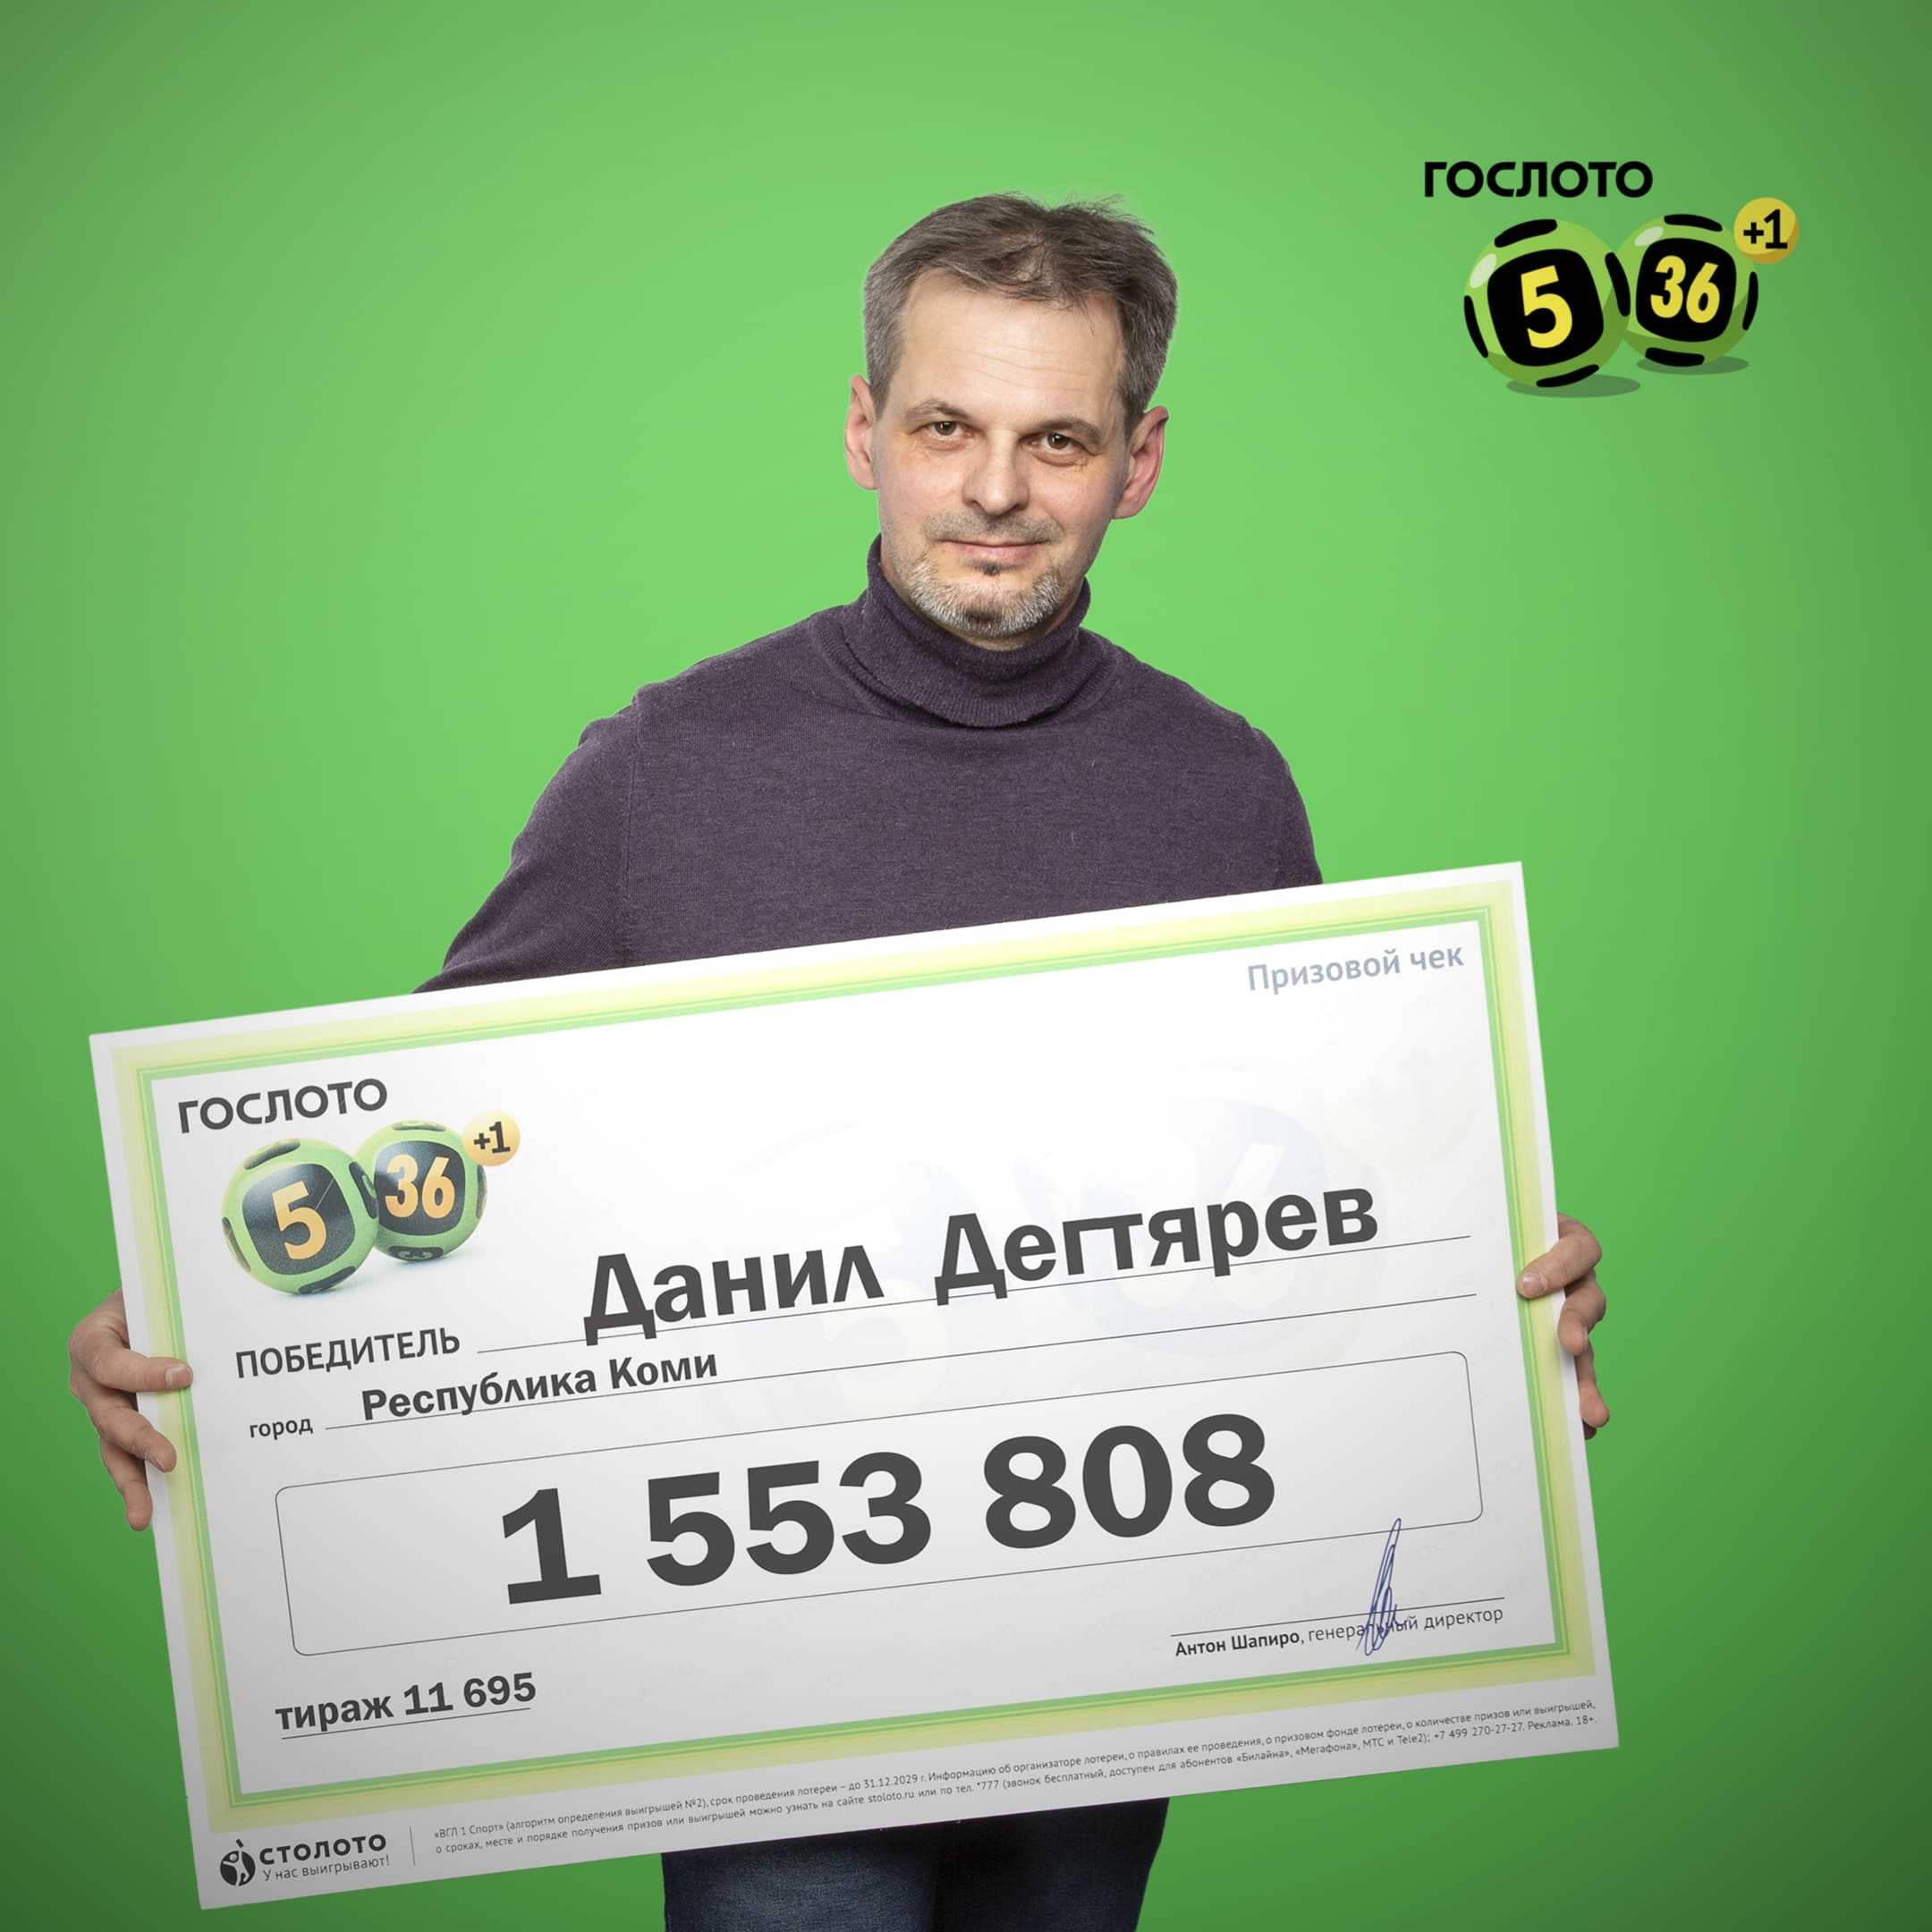 Дешевые авиабилеты агадир — марокко от 4 031 рубля на aviasales.ru